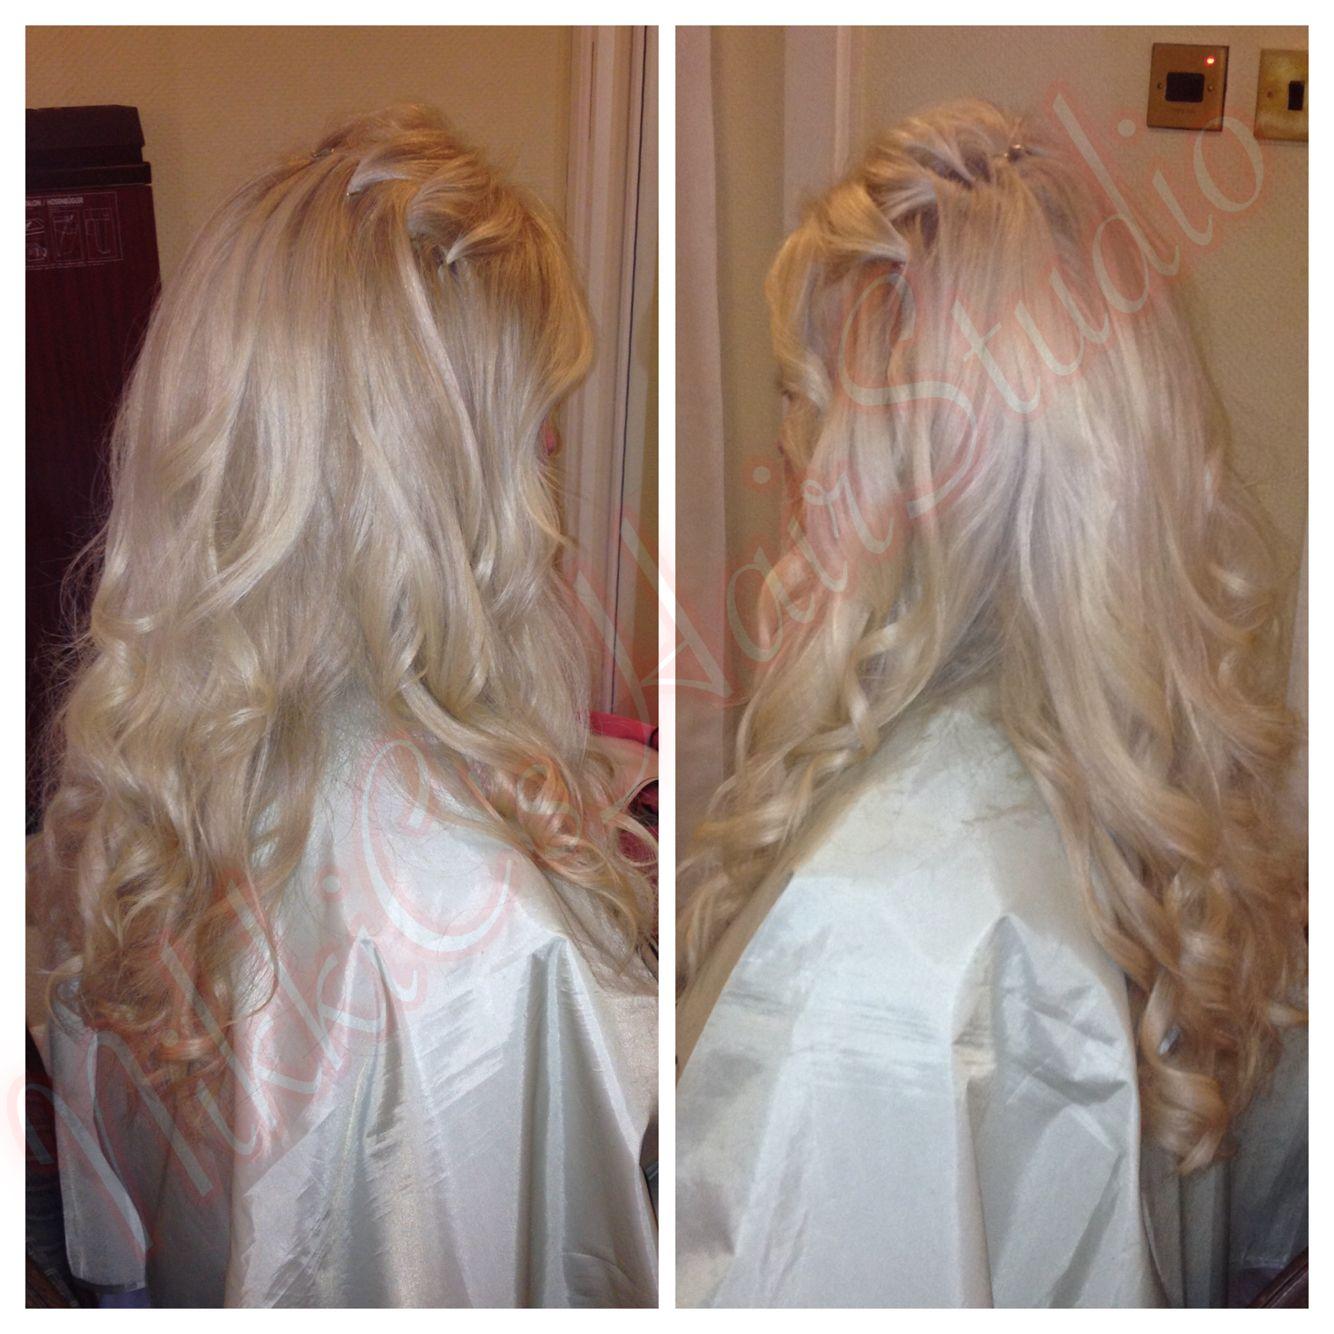 Bridal hair - Carly on her wedding day 2014